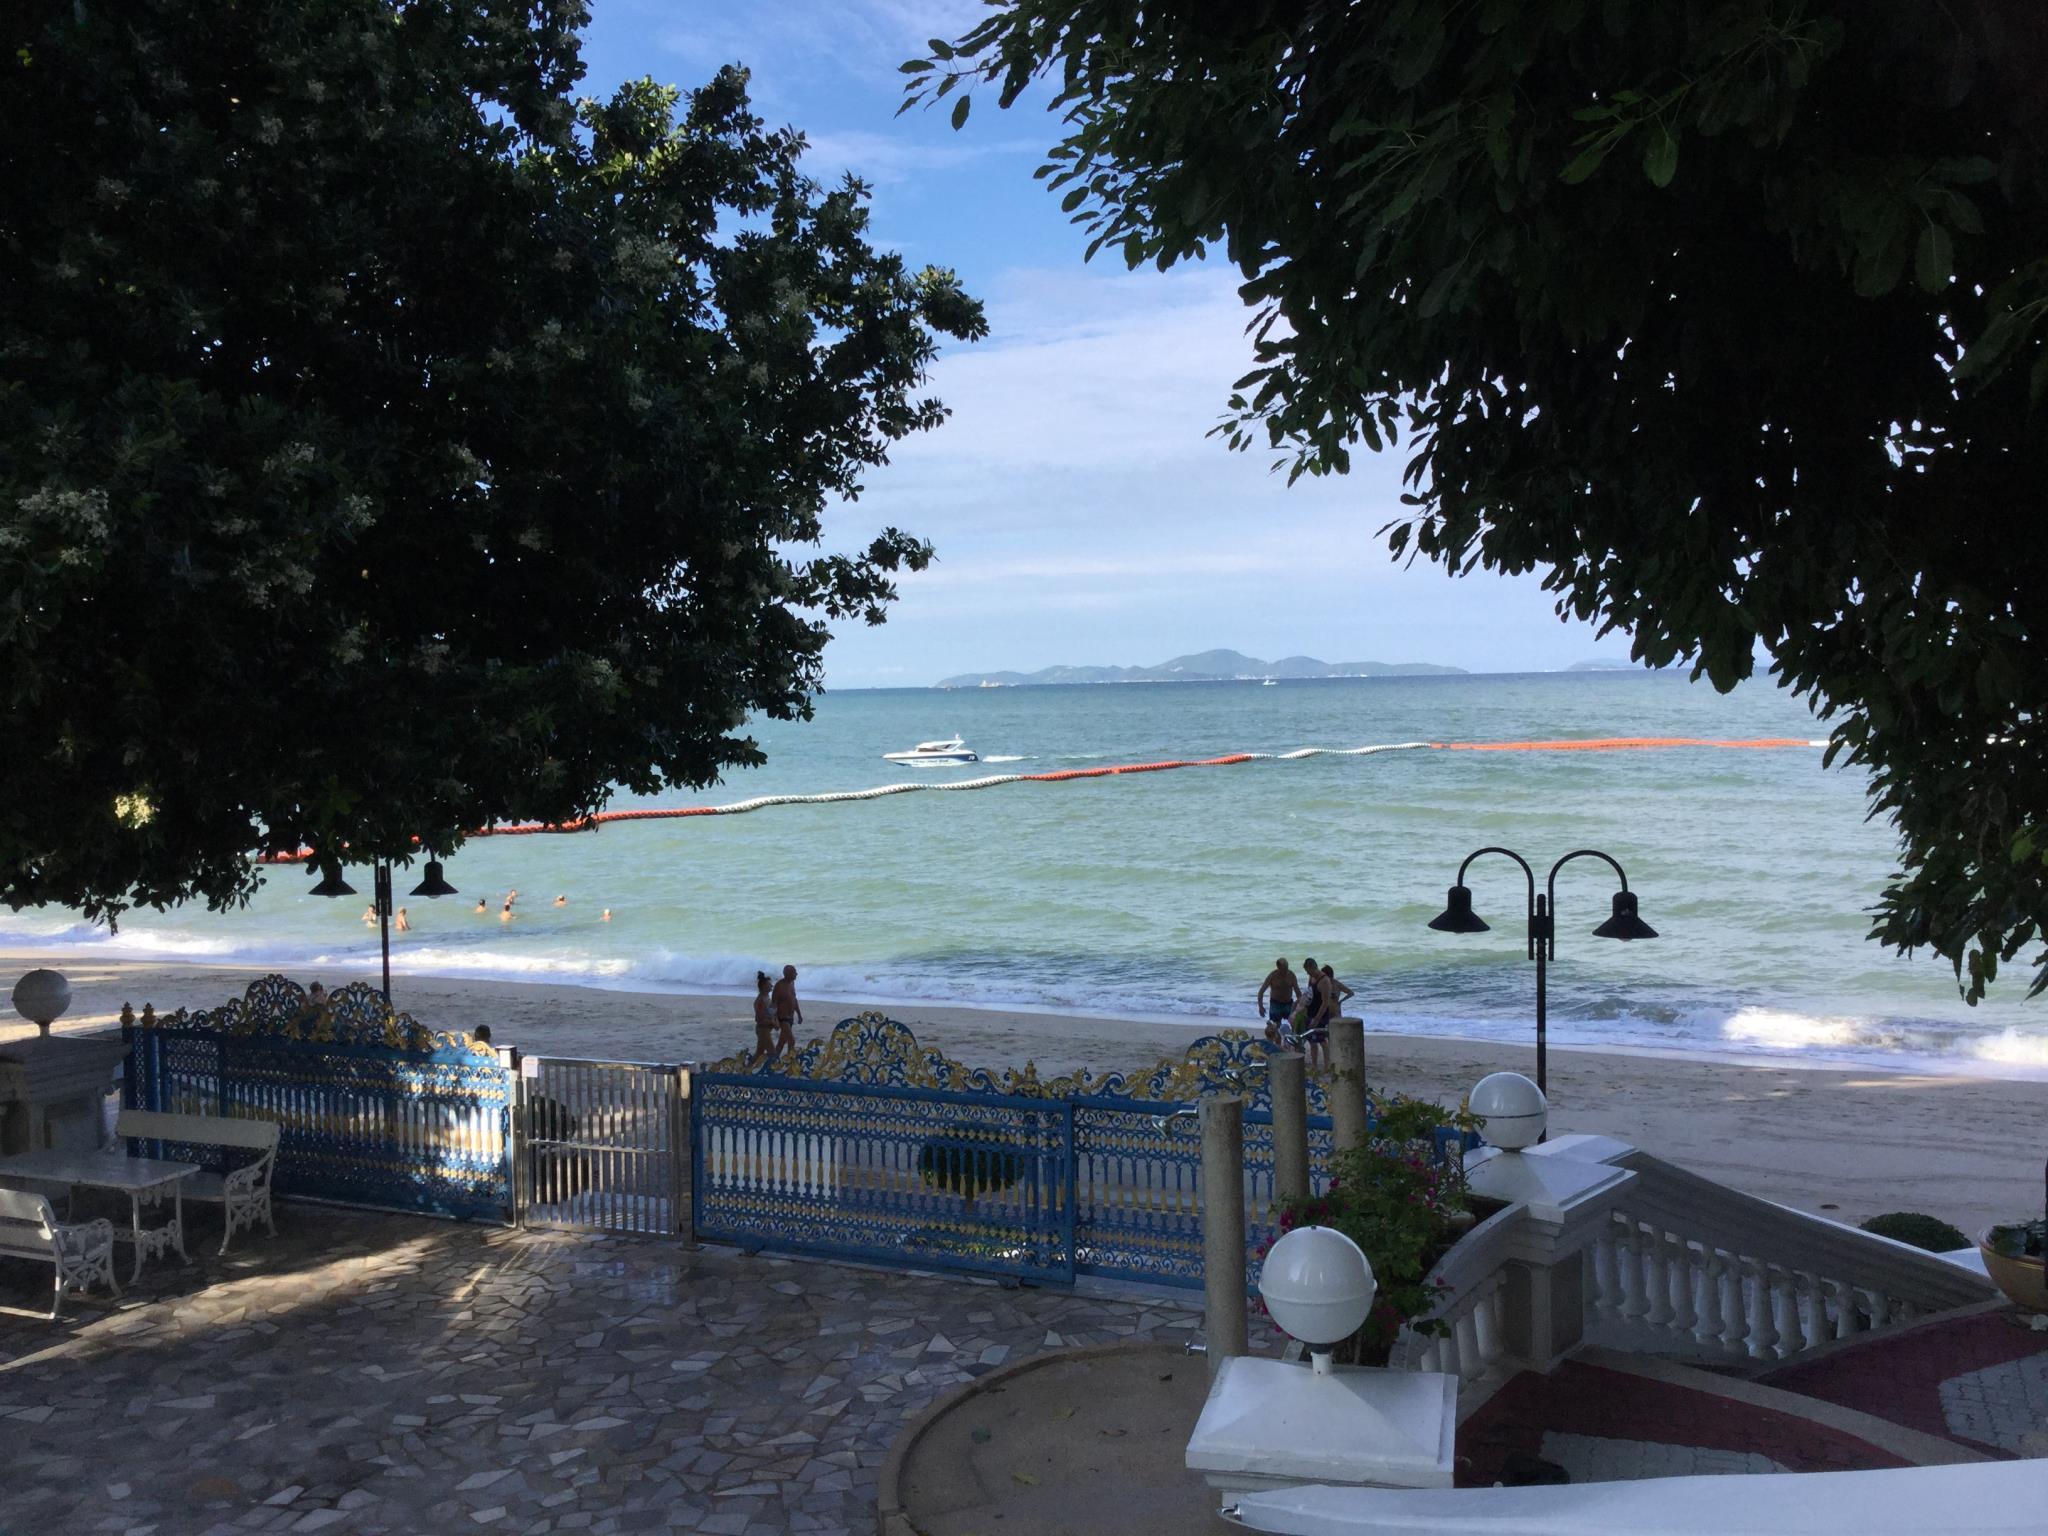 Best Price on Sky Beach Condominium in Pattaya + Reviews!